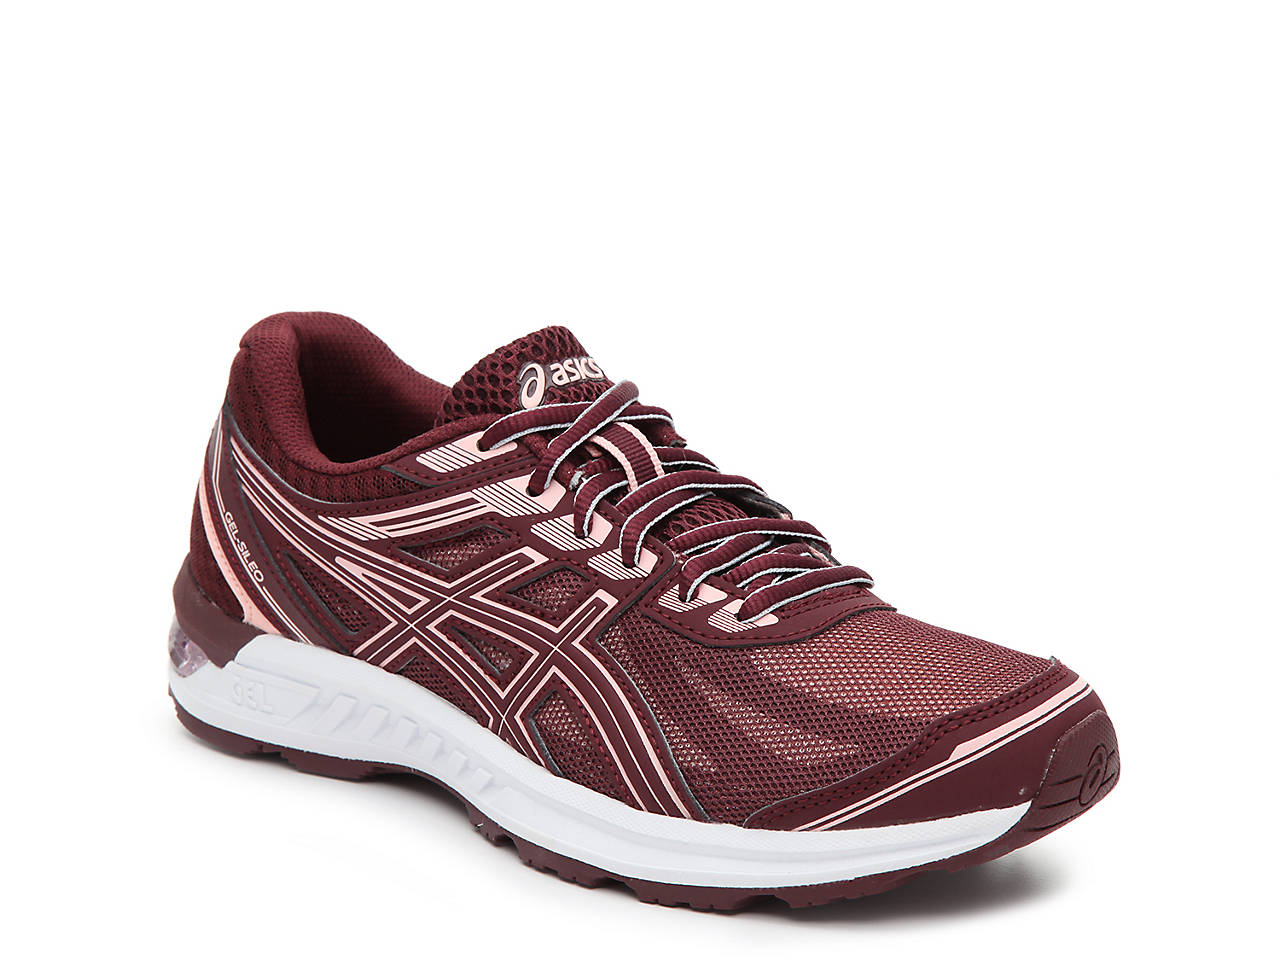 9262ffa8372 ASICS. Gel-Sileo Running Shoe - Women s